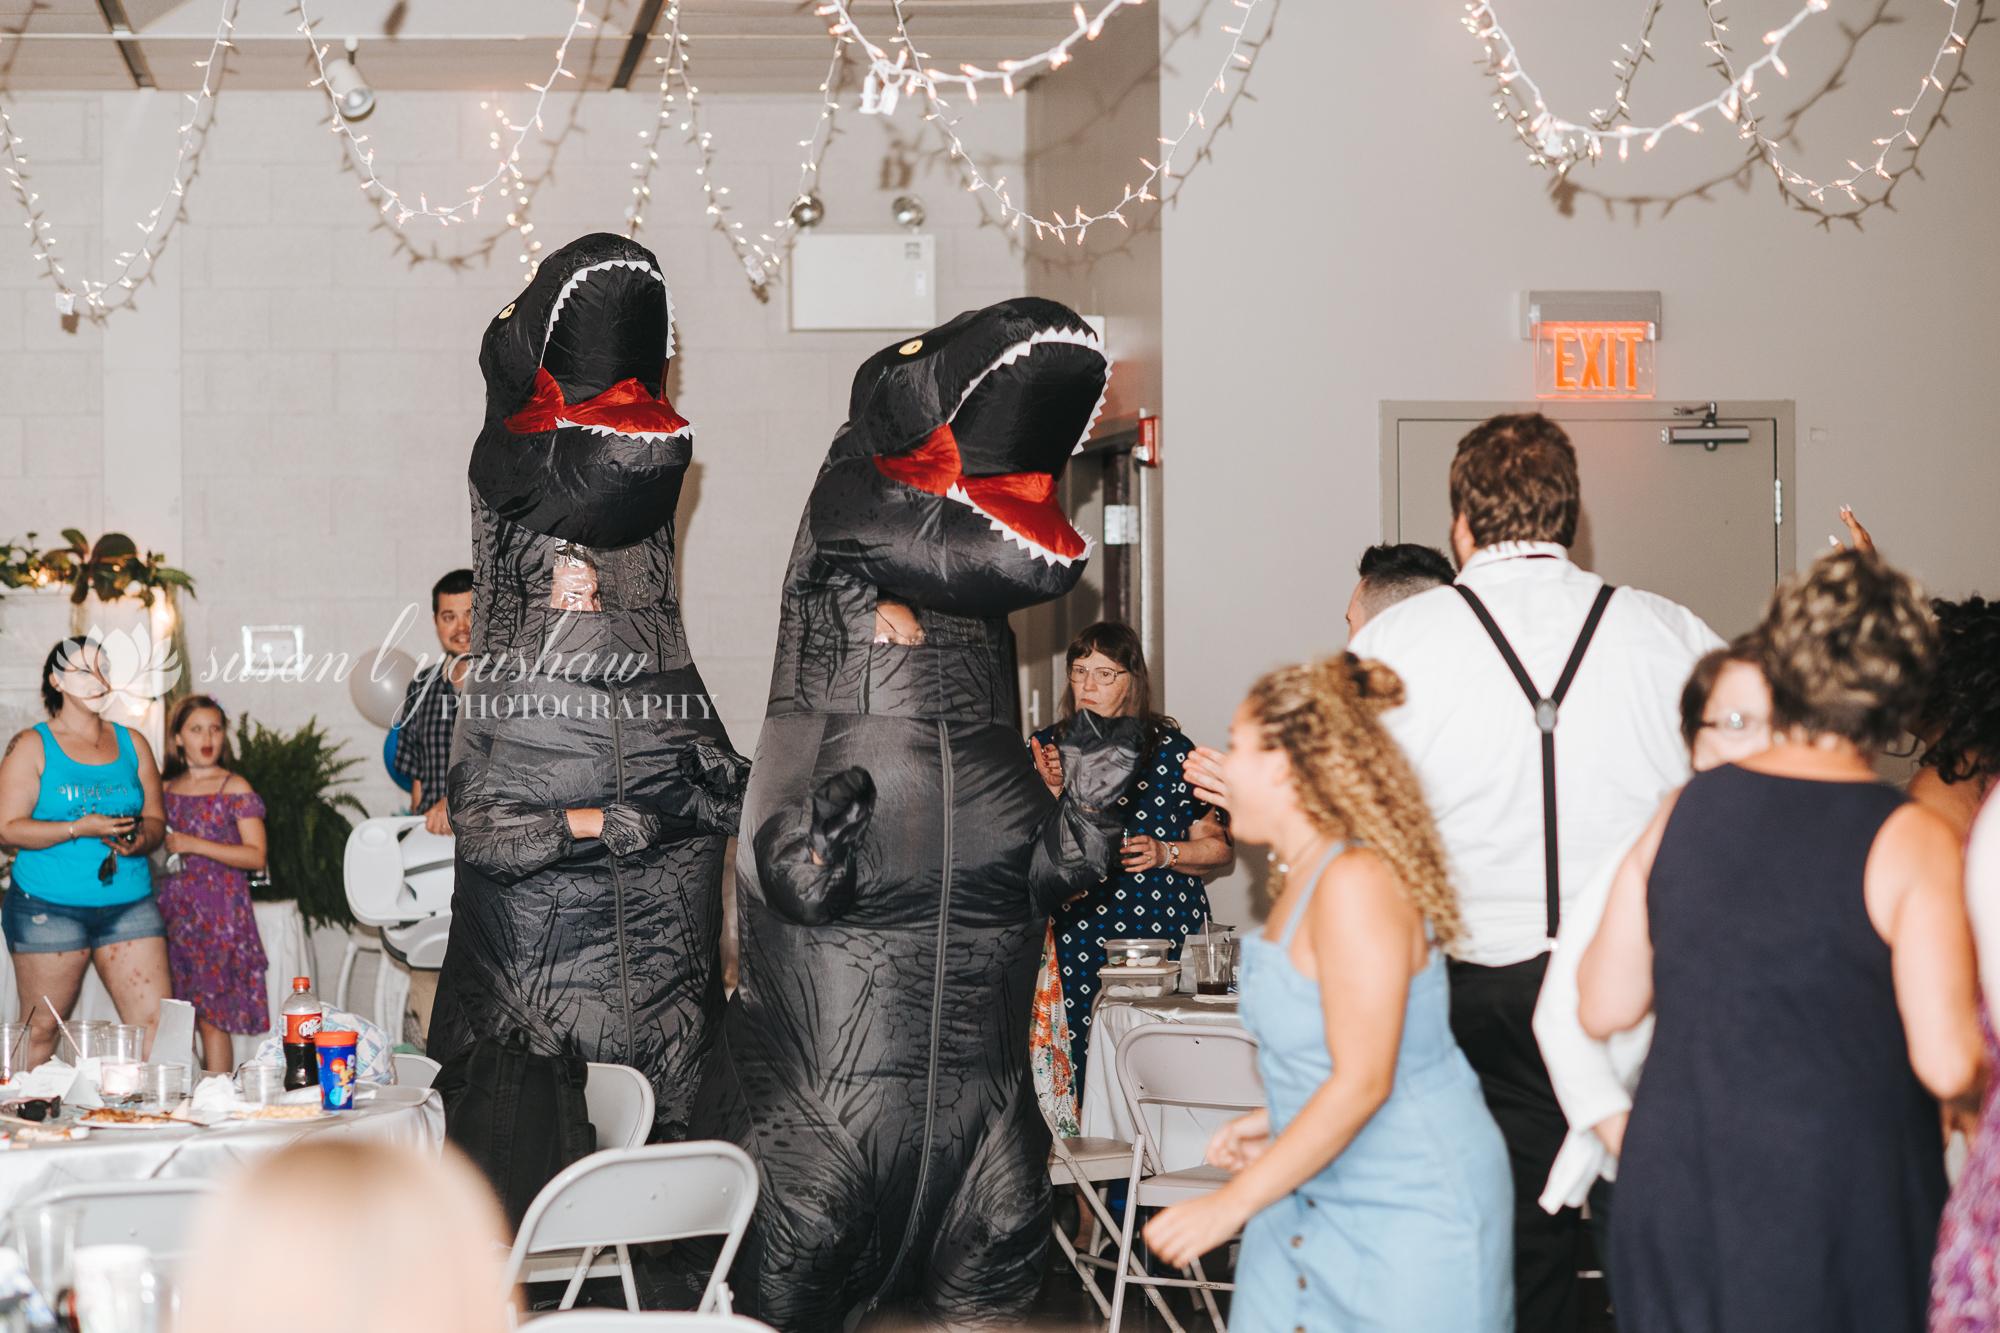 Katelyn and Wes Wedding Photos 07-13-2019 SLY Photography-128.jpg